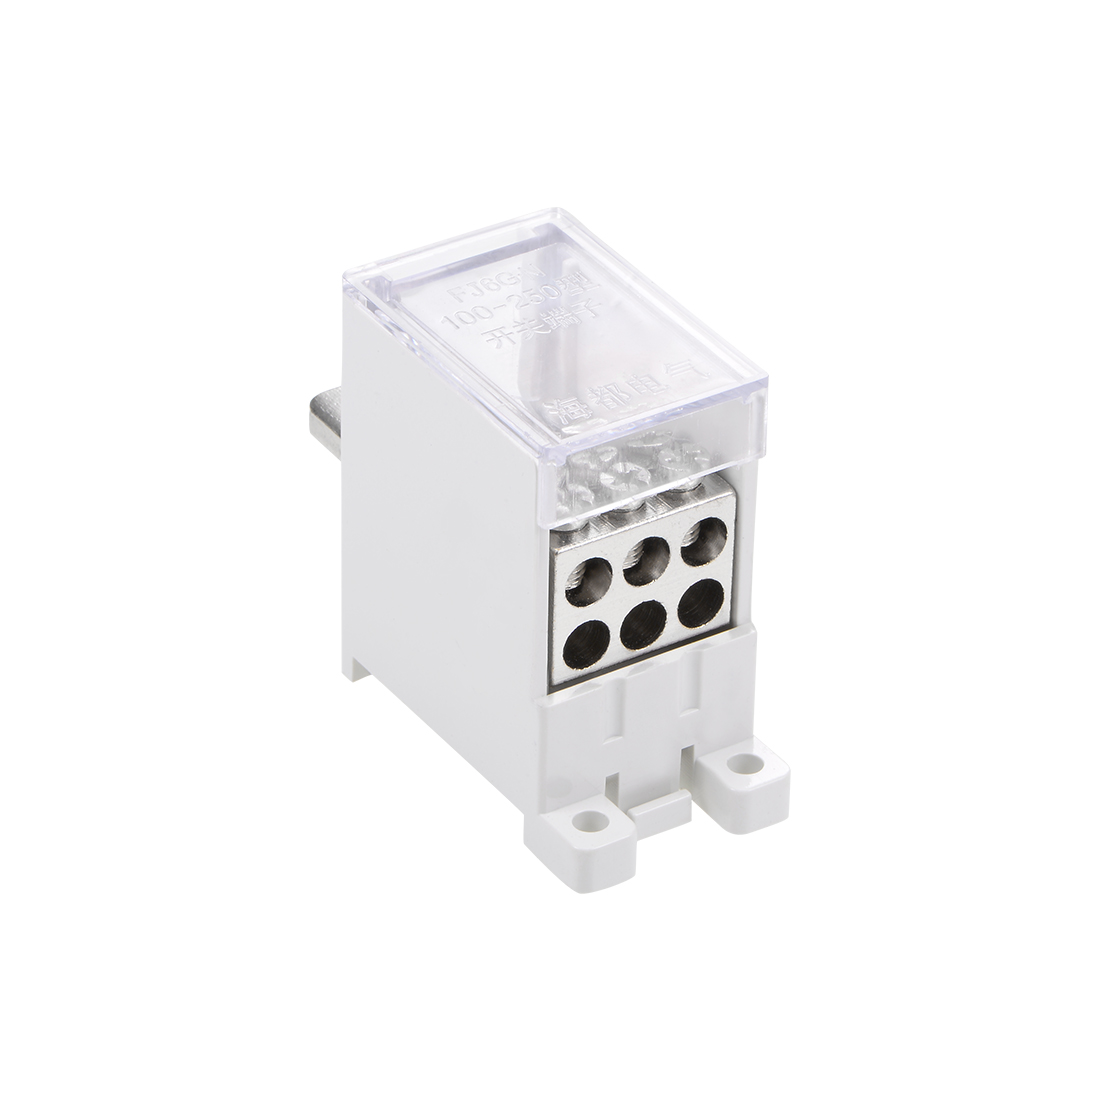 1 Inlet 6 Outlet DIN Rail Terminal Blocks 125A Max Input Distribution Block